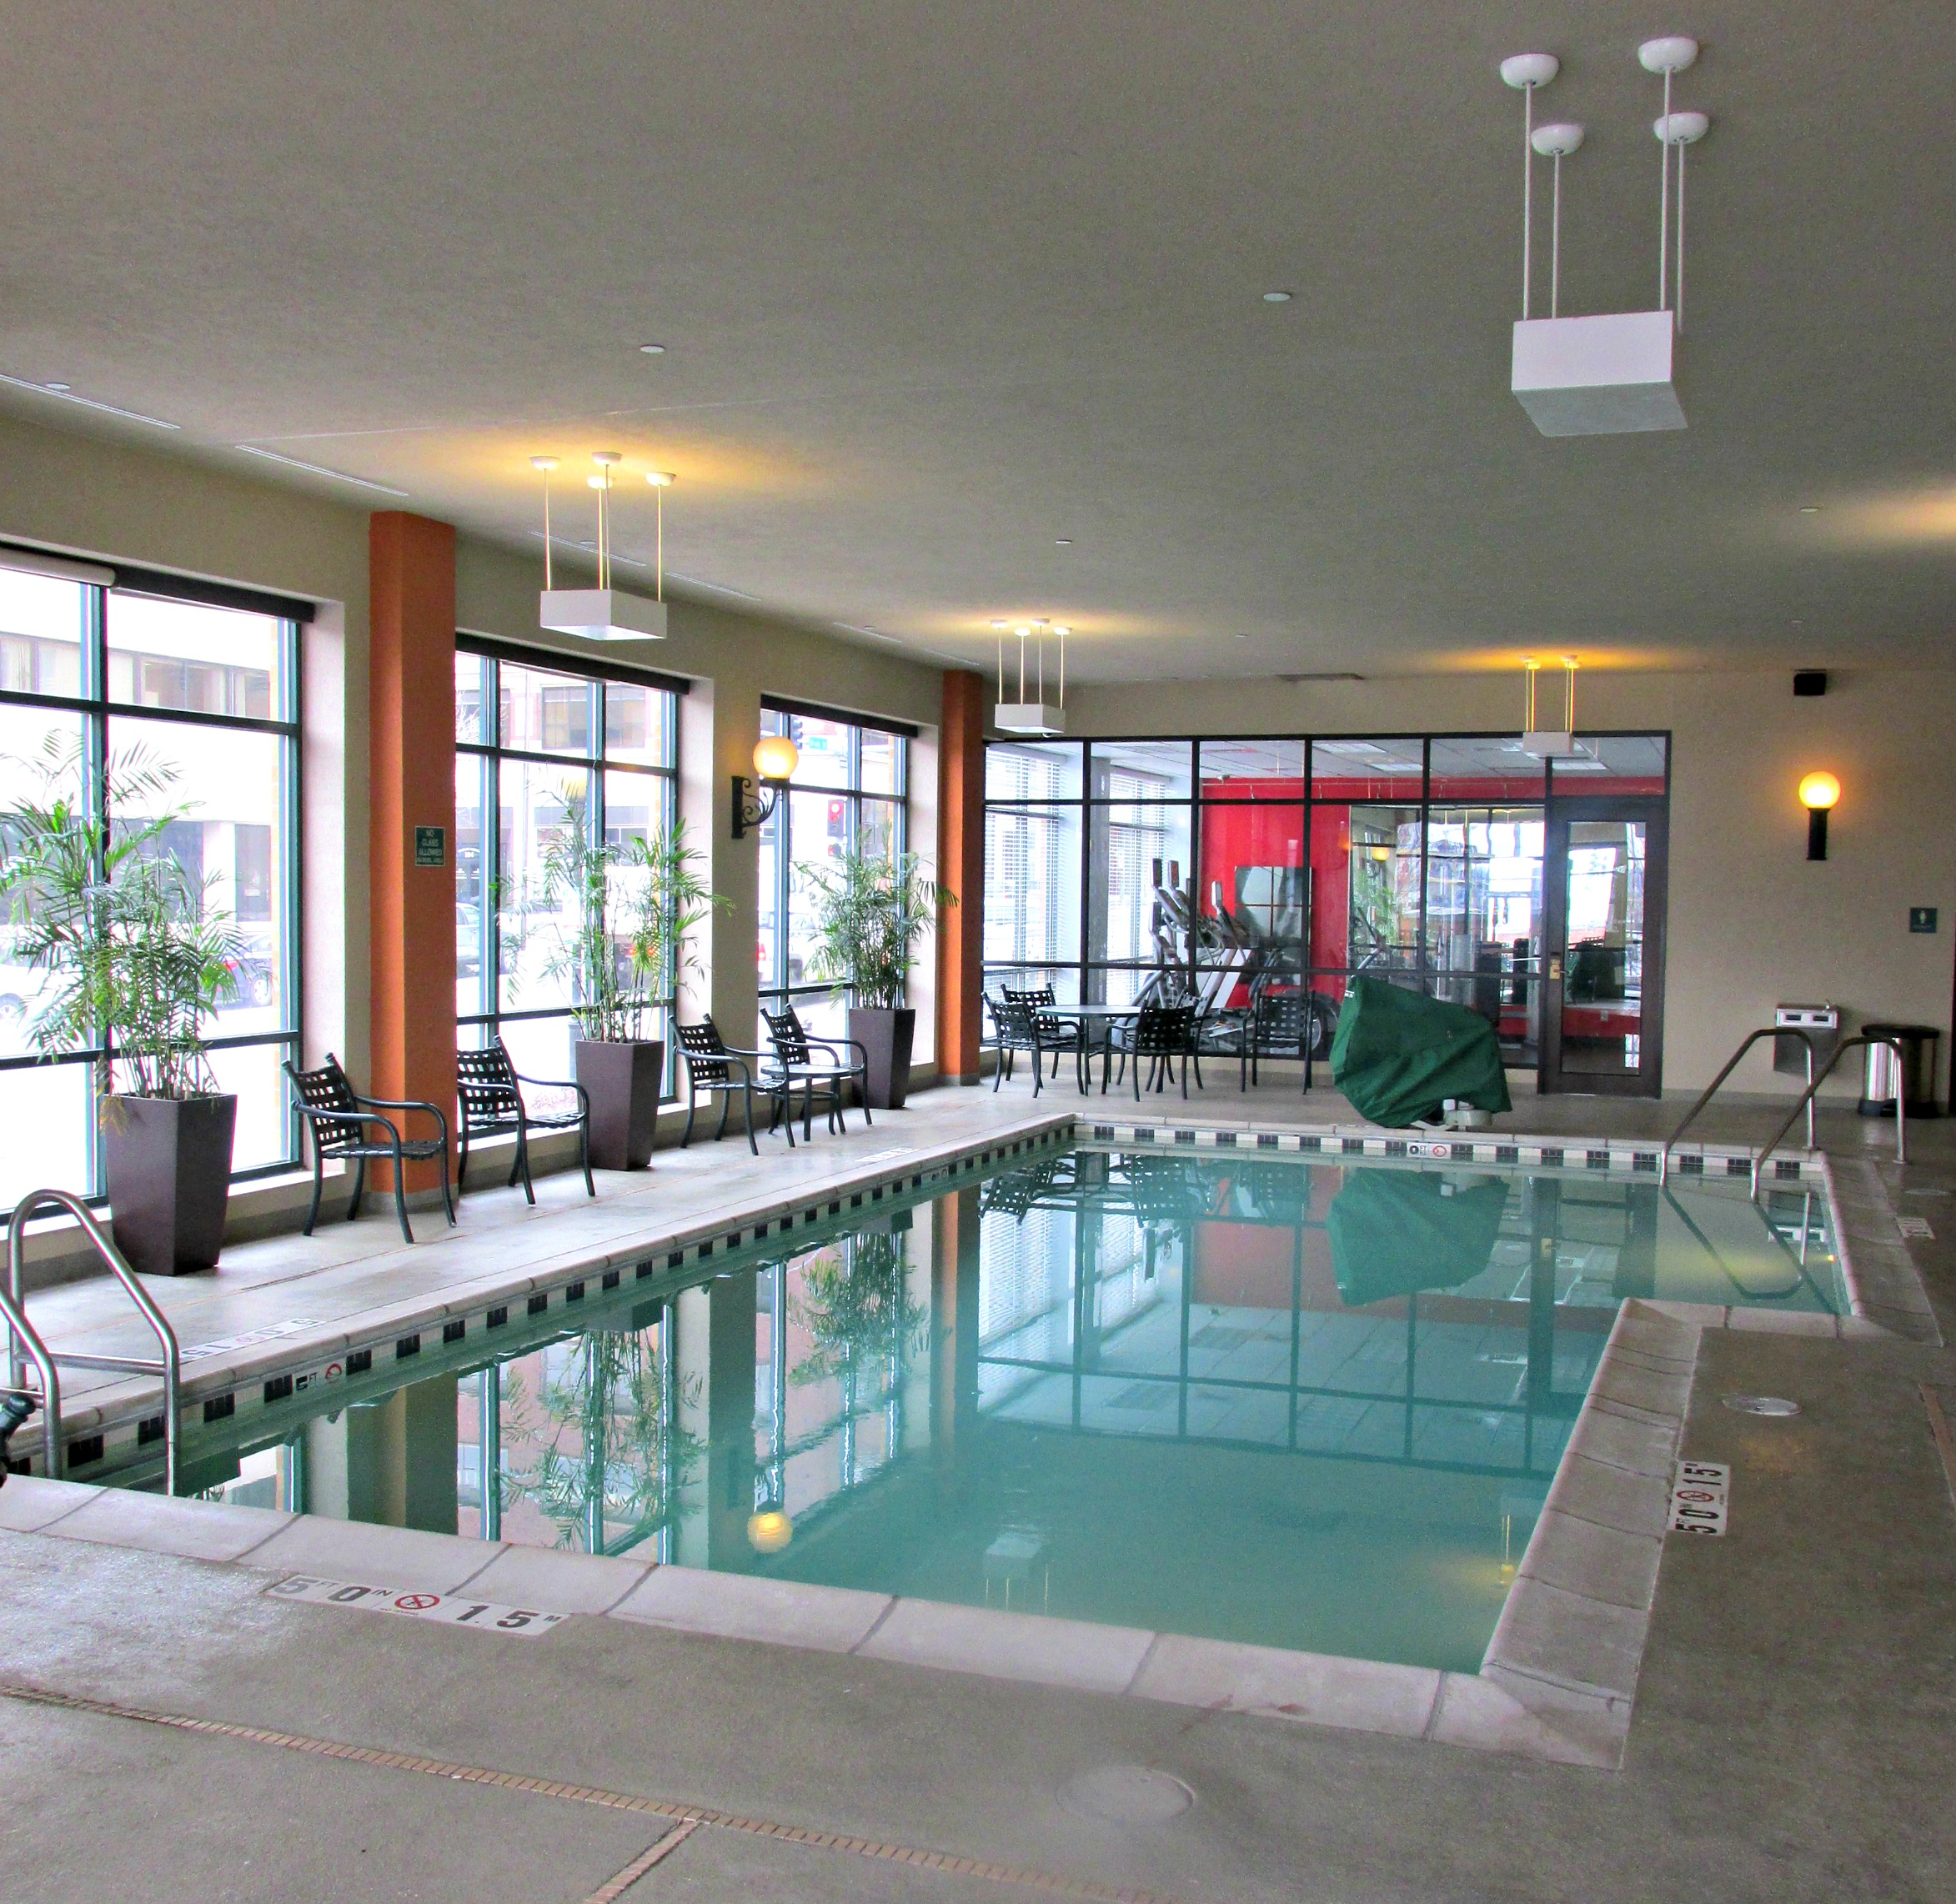 https://www.hotelsbyday.com/_data/default-hotel_image/3/15530/dvpt-65435673-pool-2346x2284.jpg